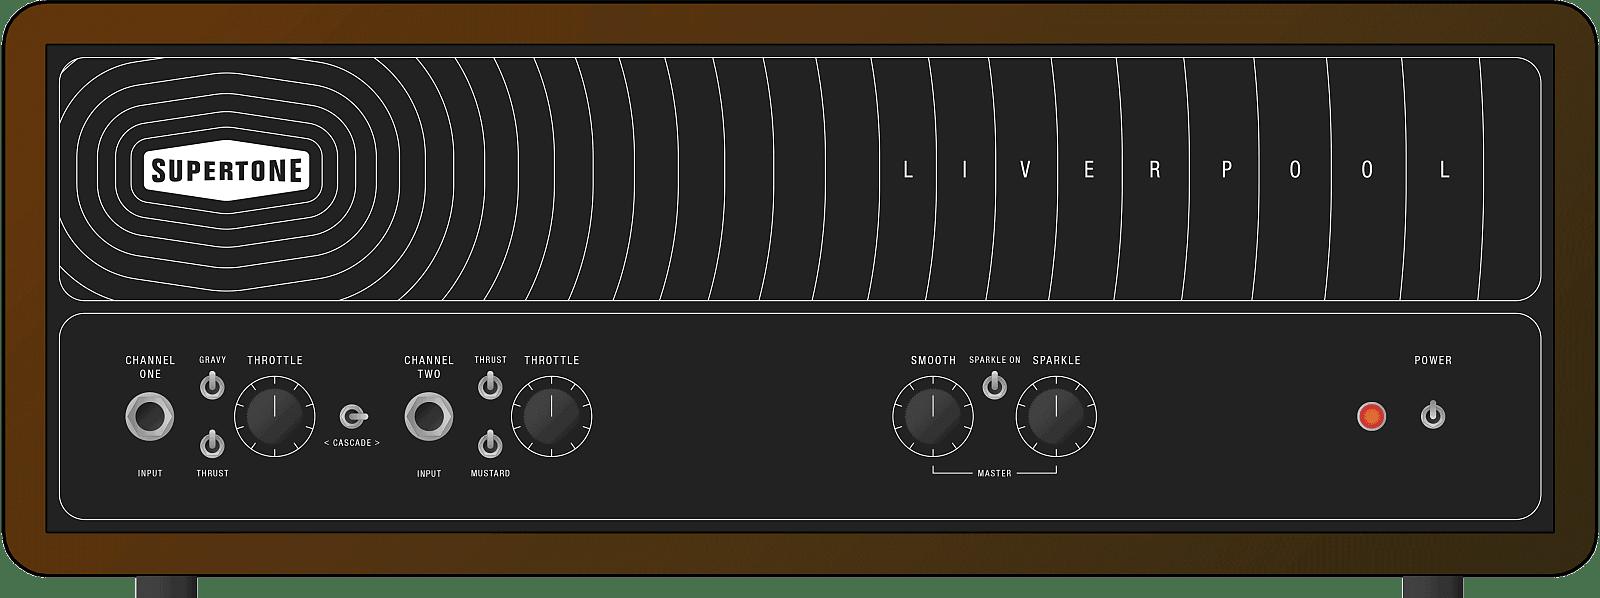 Supertone 'Liverpool' Guitar Amplifier - 36W / Black Tolex